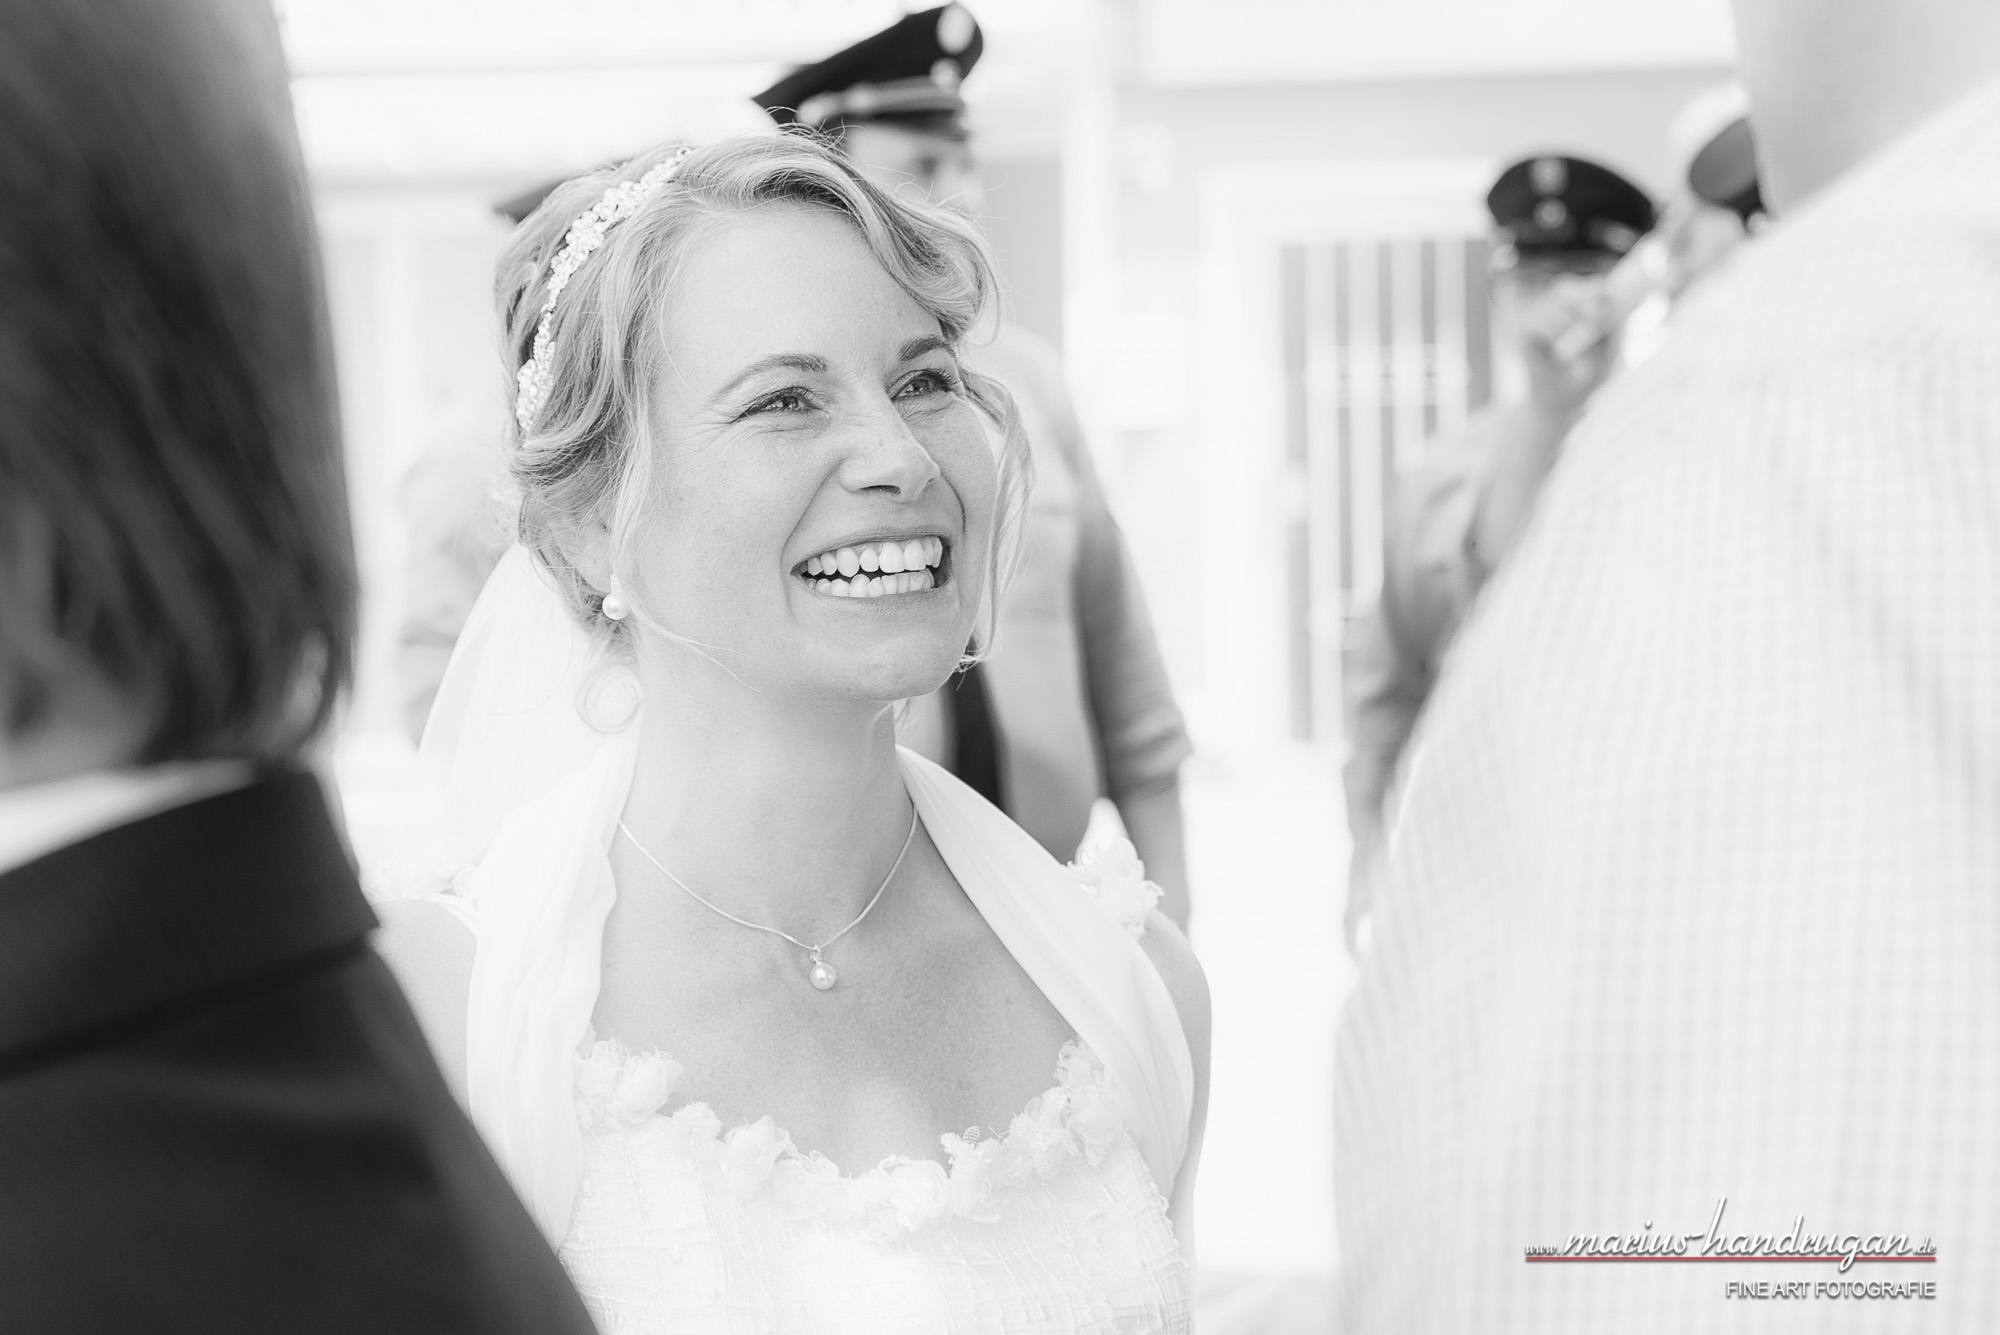 Hochzeitsfotograf Passau Marius Handrugan